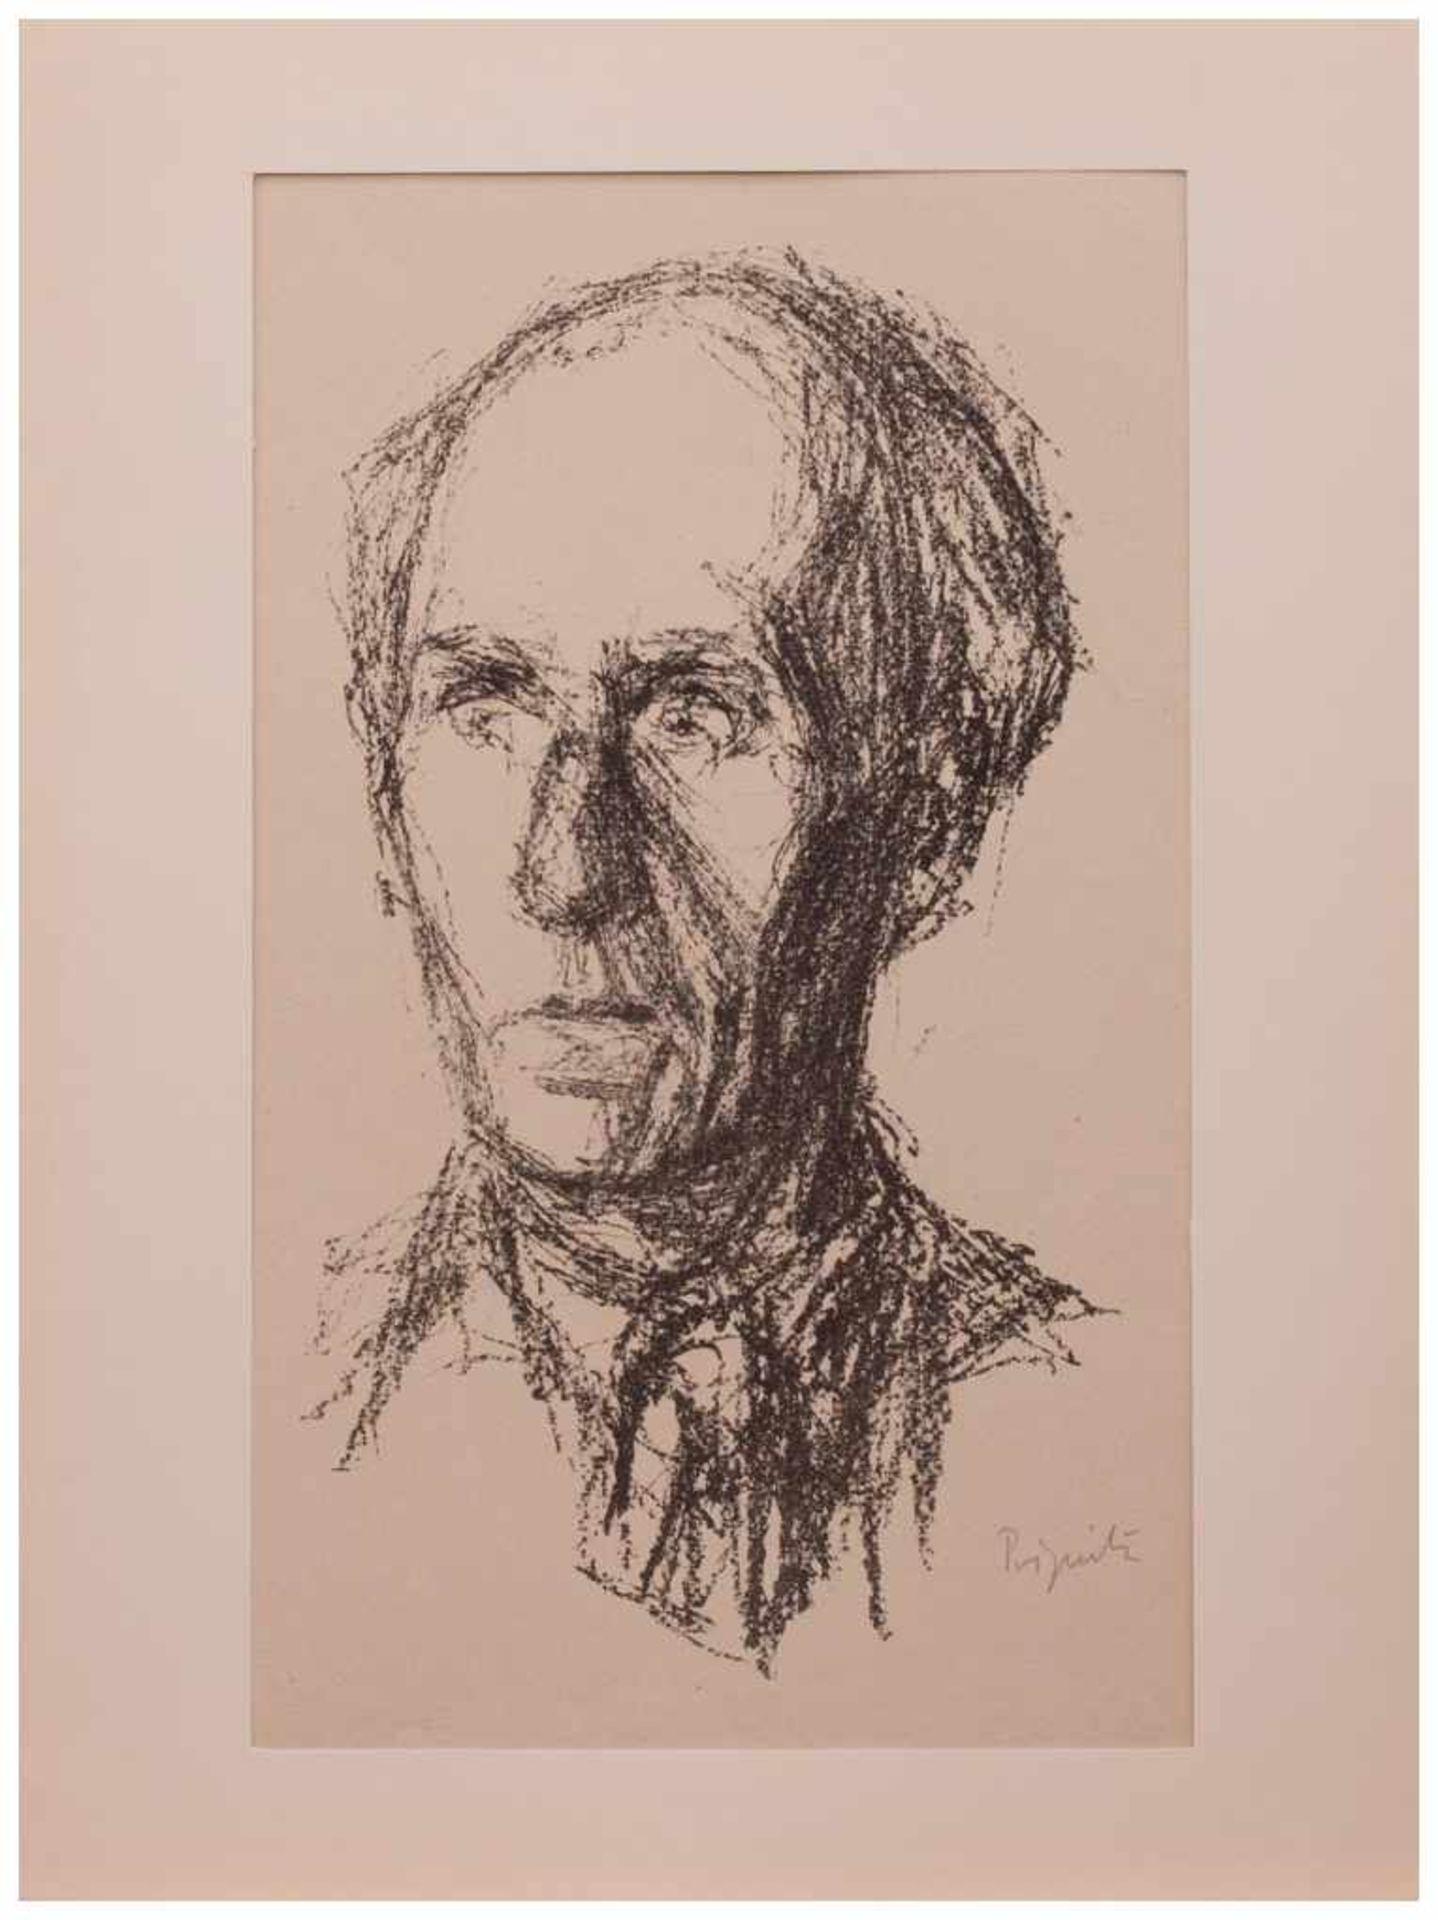 Los 32 - Kurt Prignitz (Hamburg 1914 - 1983 Groß Hansdorf, deutscher Maler u. Grafiker, Std. a.d.